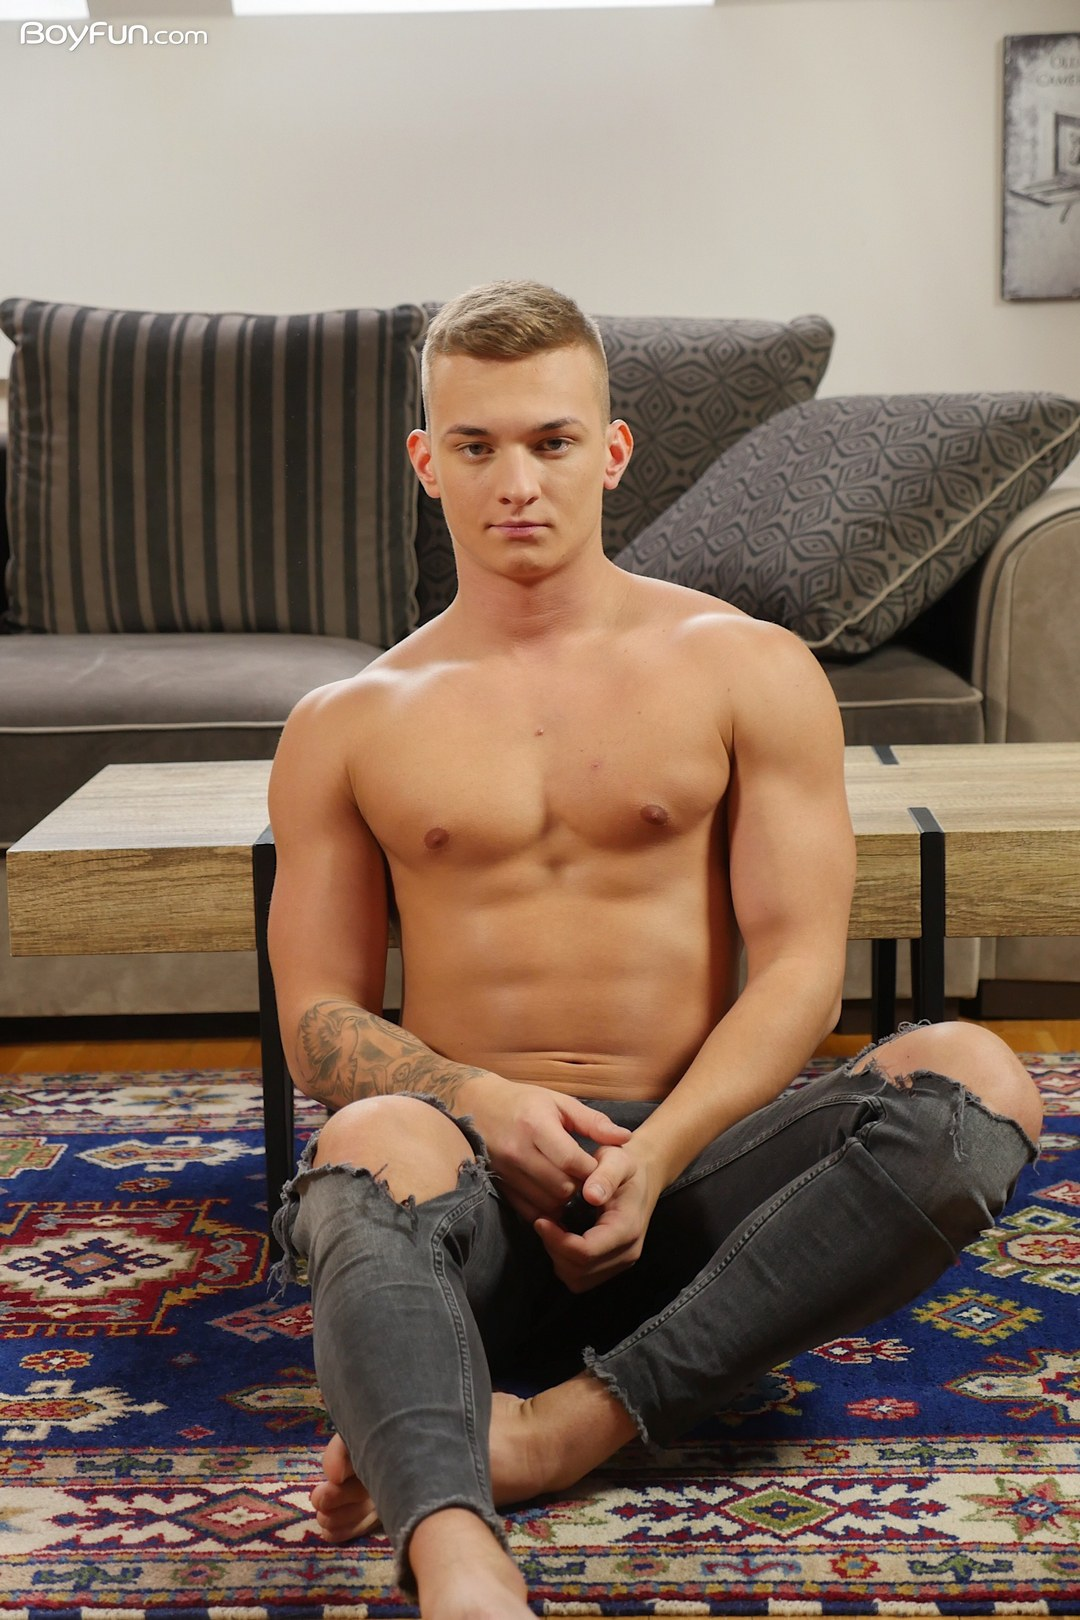 Sexy Lucas Drake from BoyFun getting naked